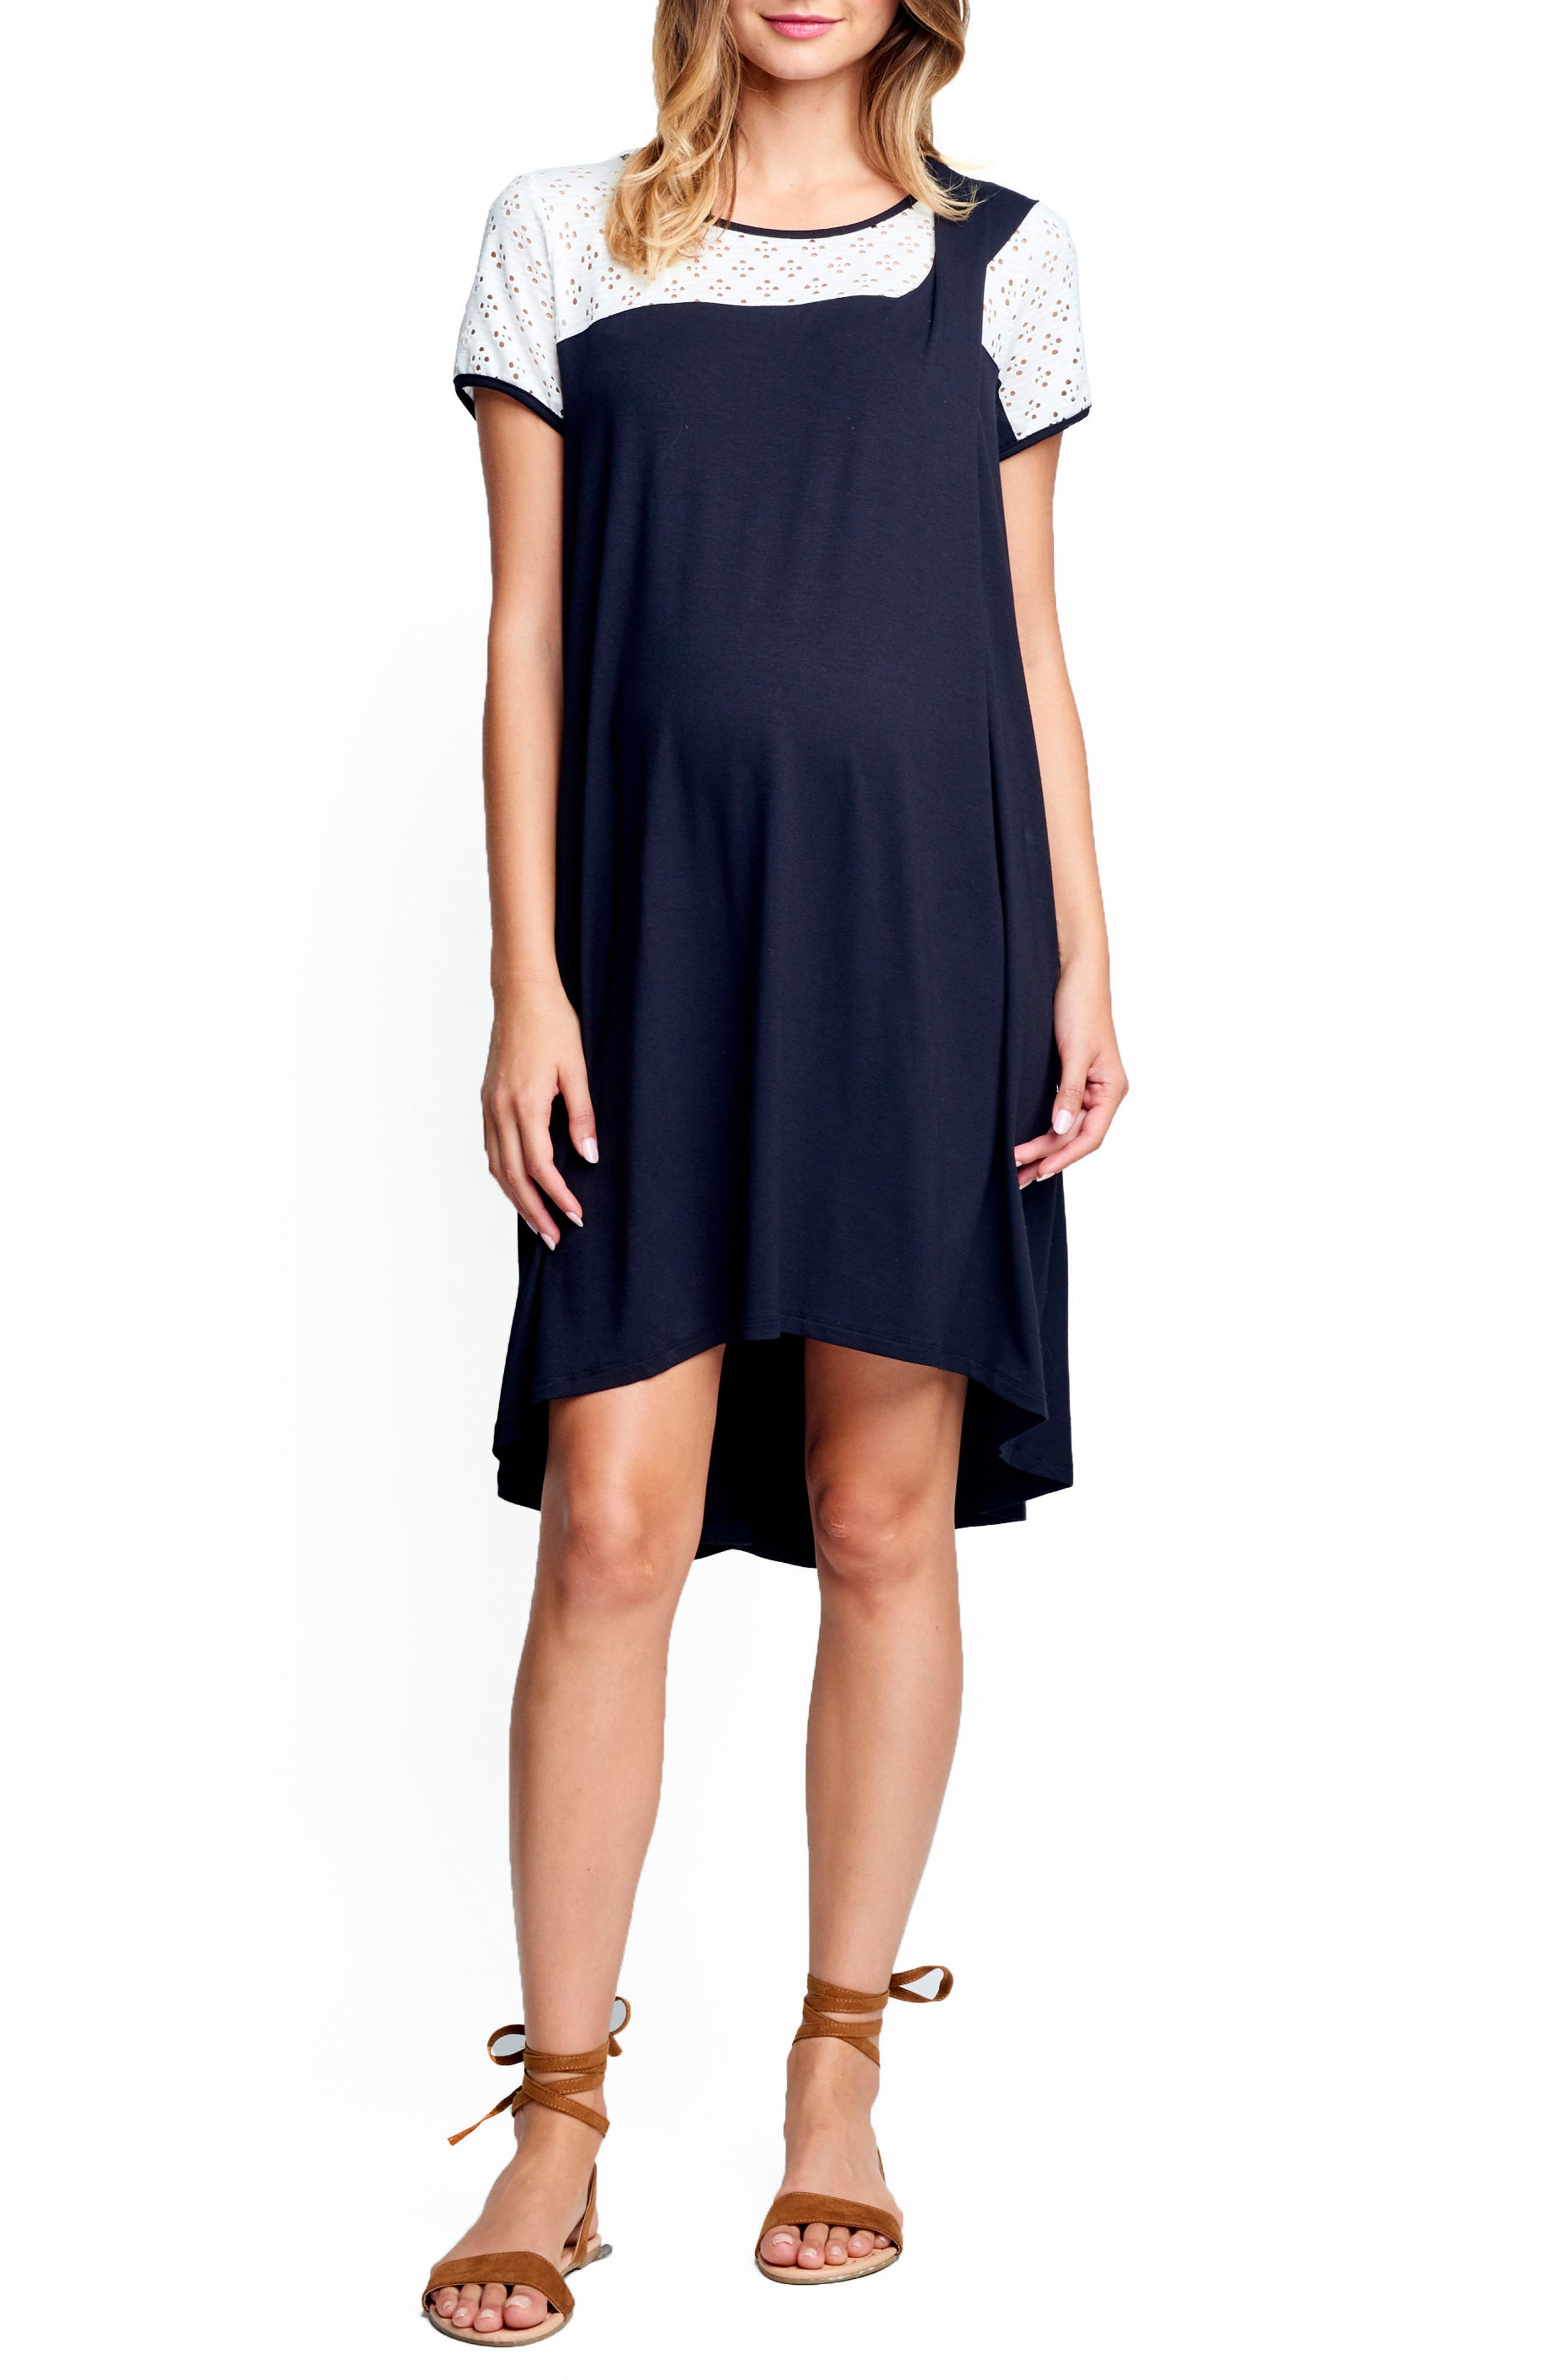 MATERNAL AMERICA, Drape High/Low Maternity Dress, Main thumbnail 1, color, 100